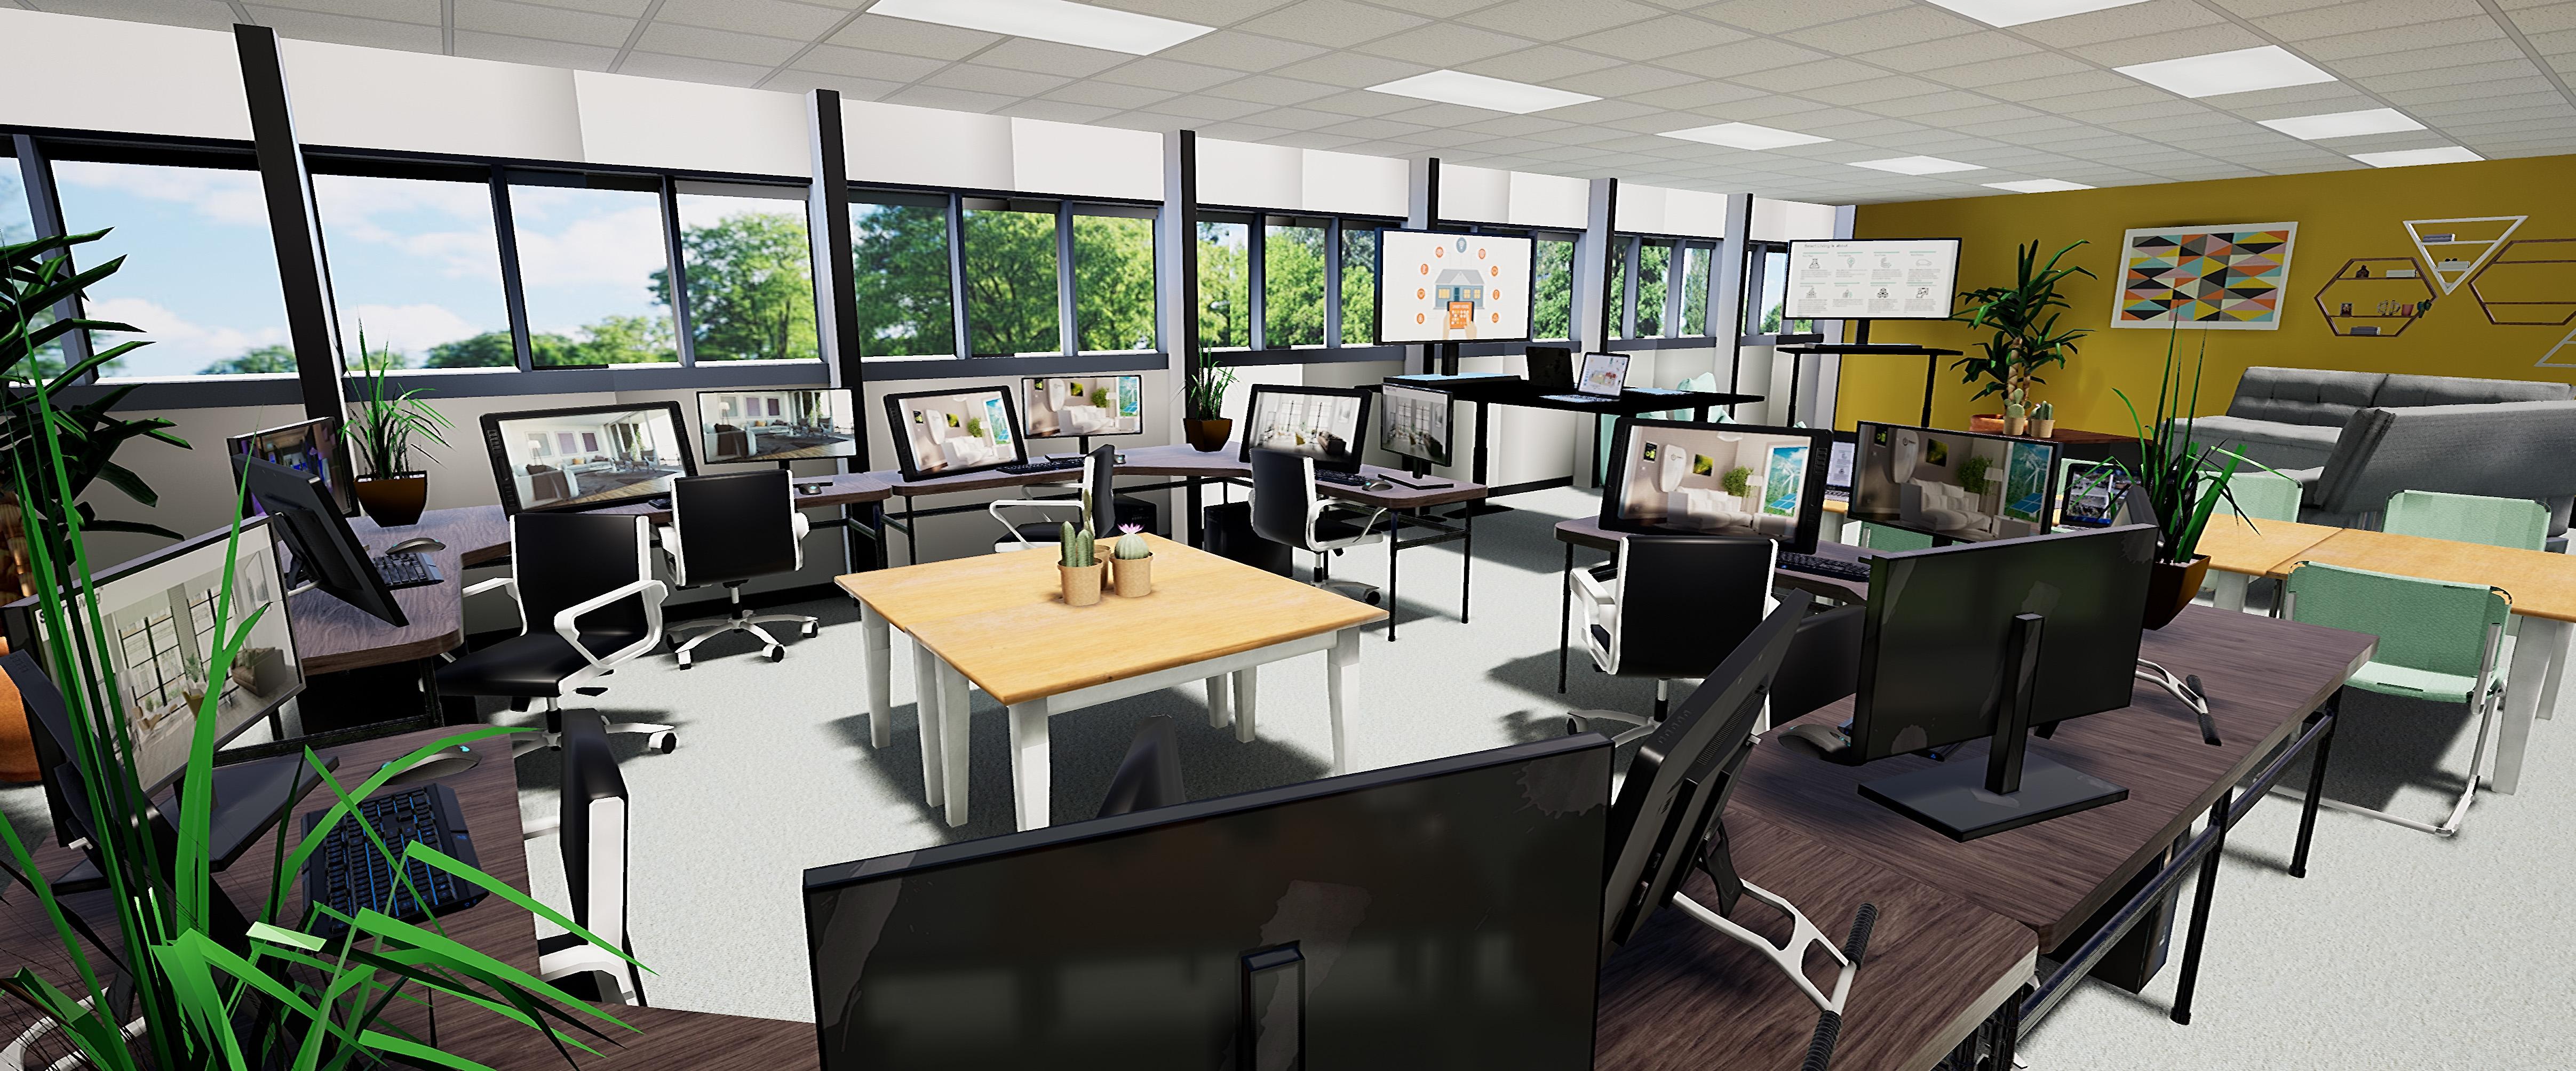 Adastral-Park Oberon-Office (2)